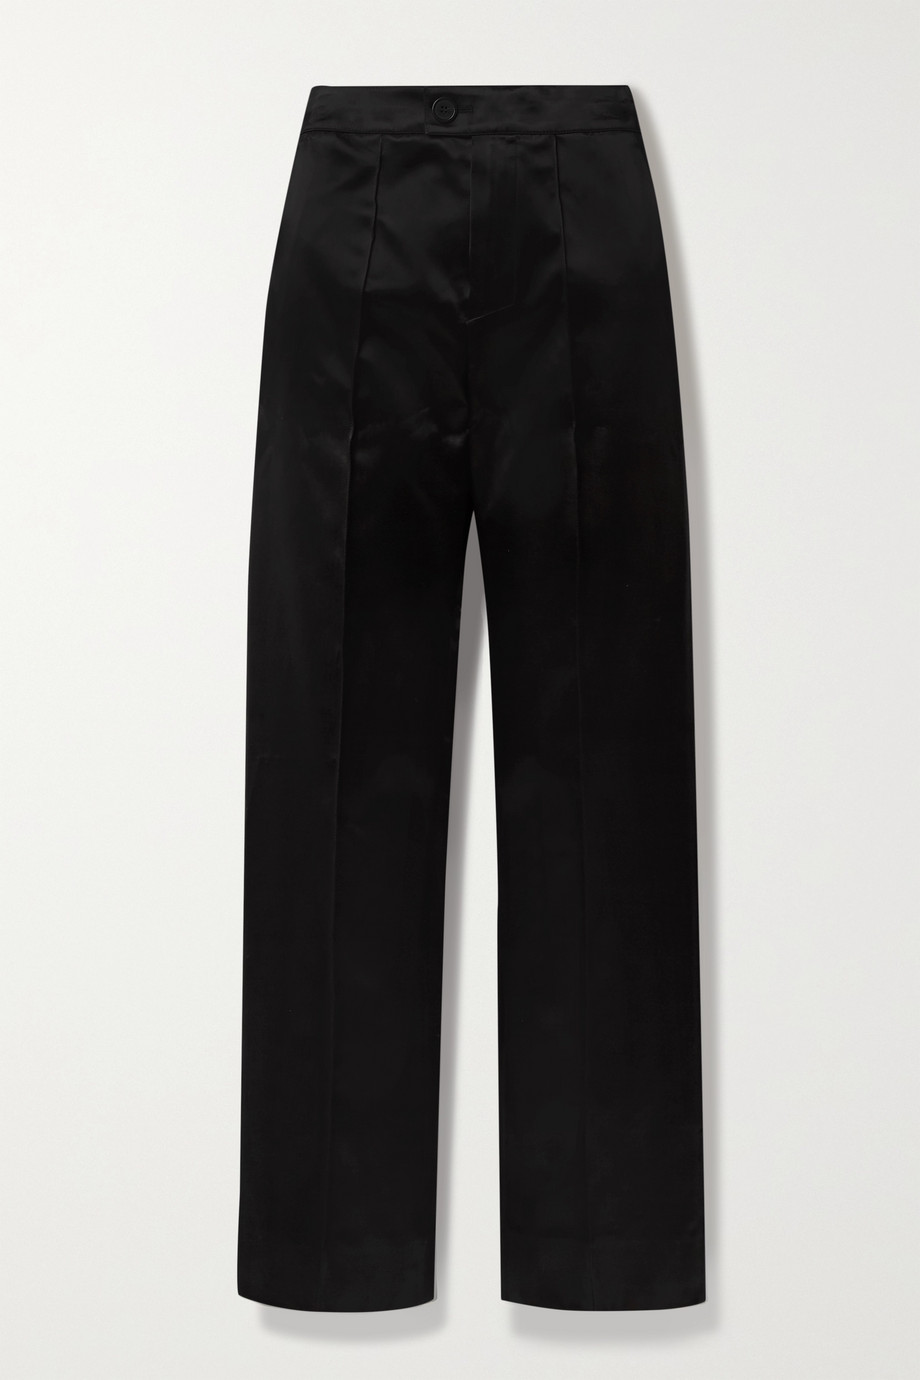 Kwaidan Editions Duchesse-satin straight-leg pants